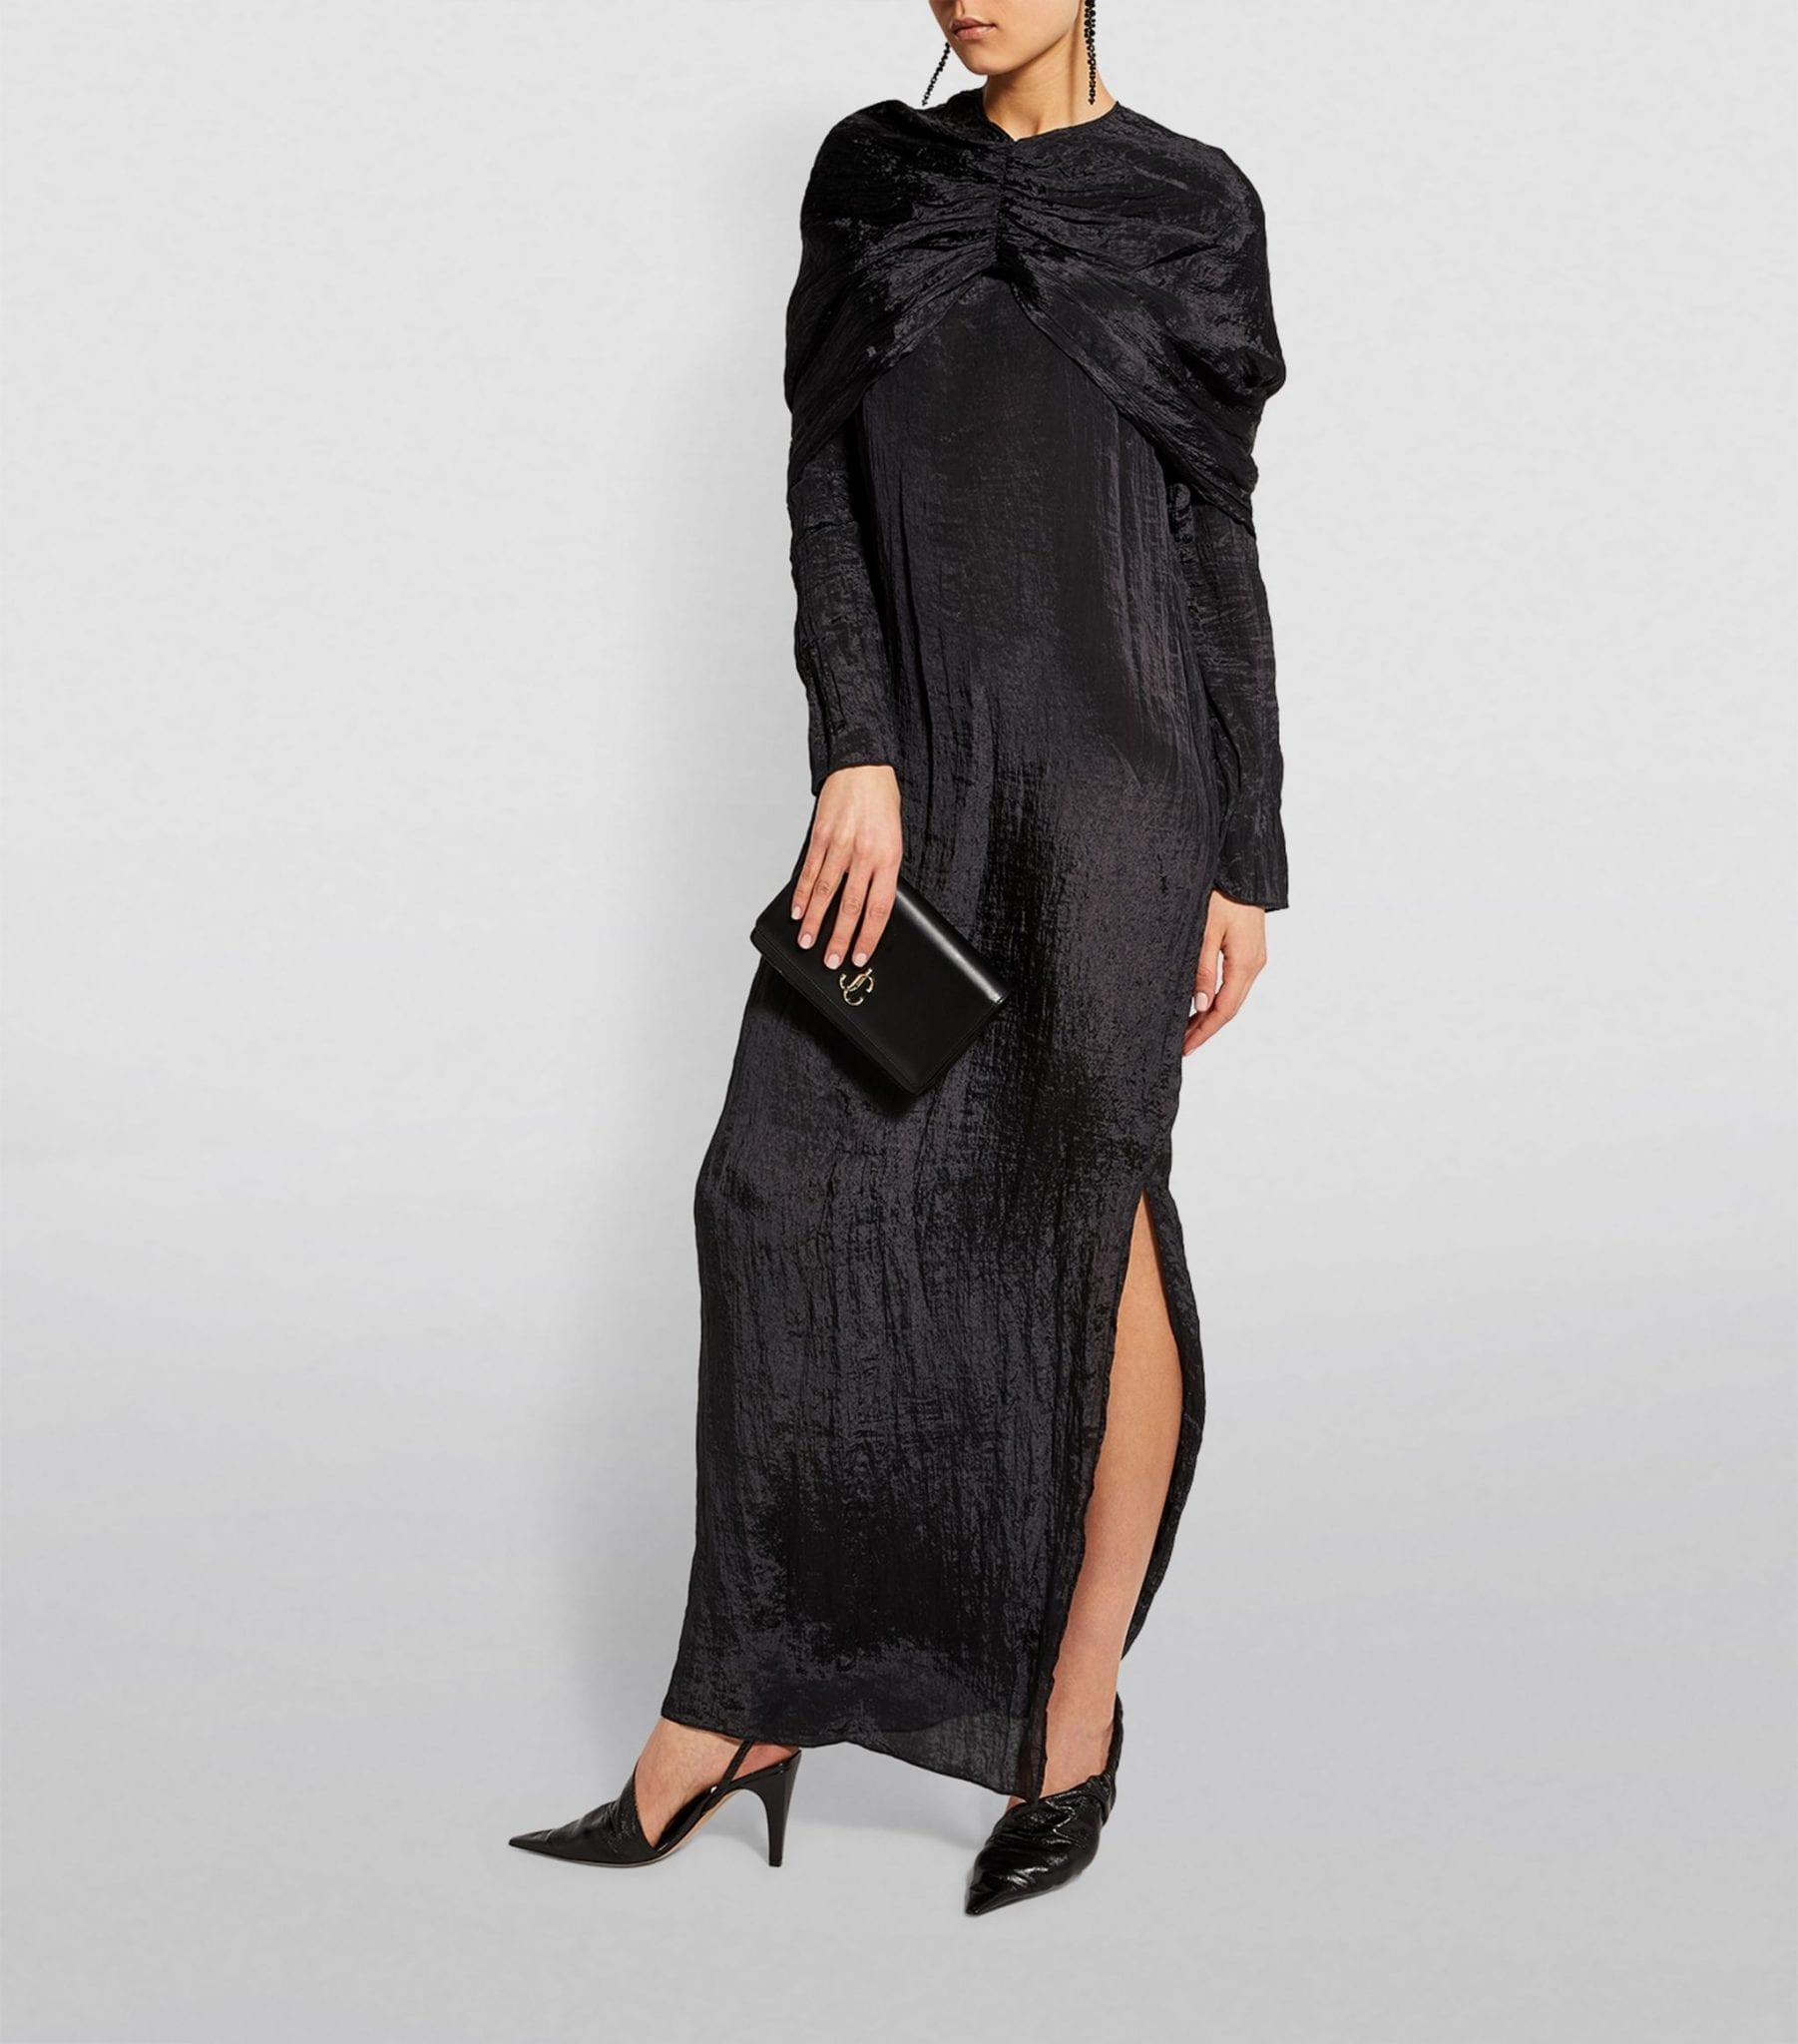 DEVEAUX Cape-Sleeved Emma Dress